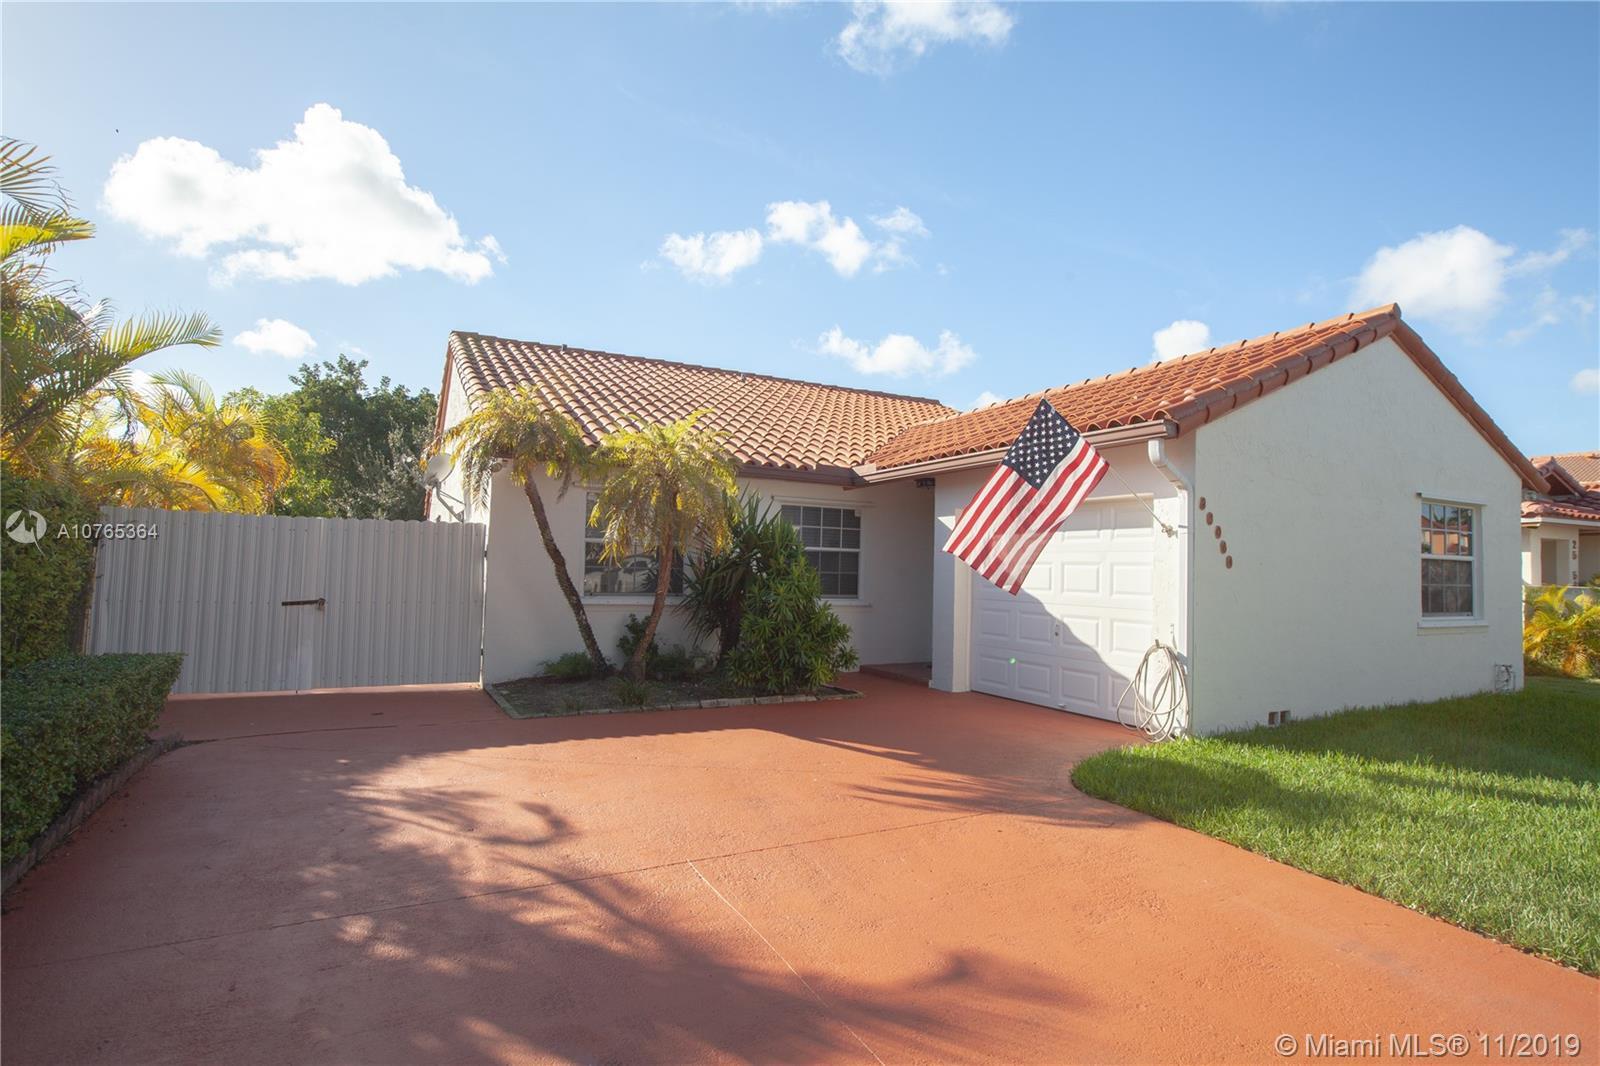 25064 123rd Pl, Homestead, FL 33032 - Homestead, FL real estate listing